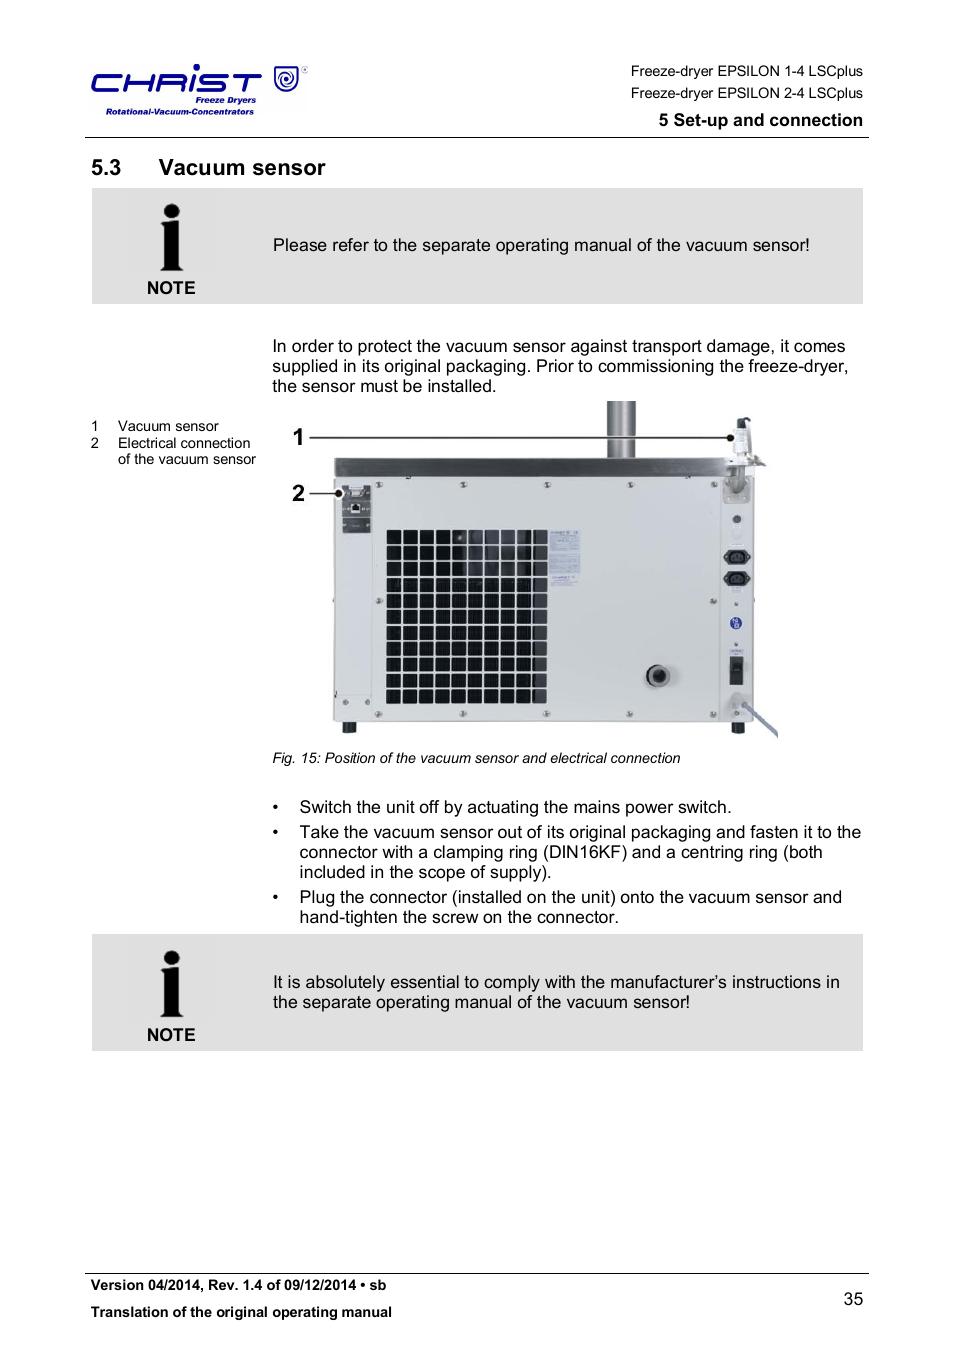 3 vacuum sensor | Martin Christ Epsilon 2-4 LSCplus User